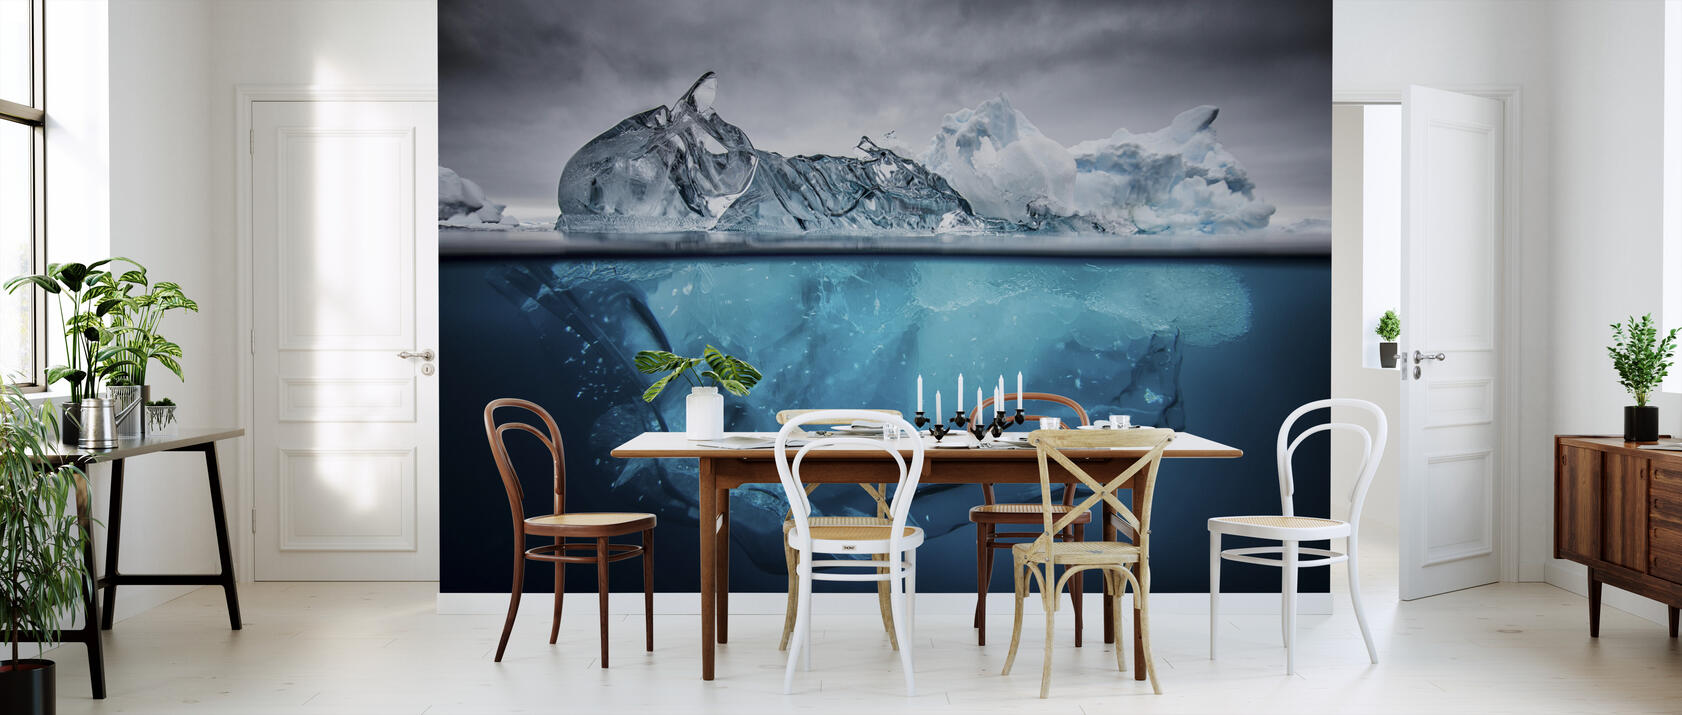 buoyancy mit fototapeten einrichten photowall. Black Bedroom Furniture Sets. Home Design Ideas